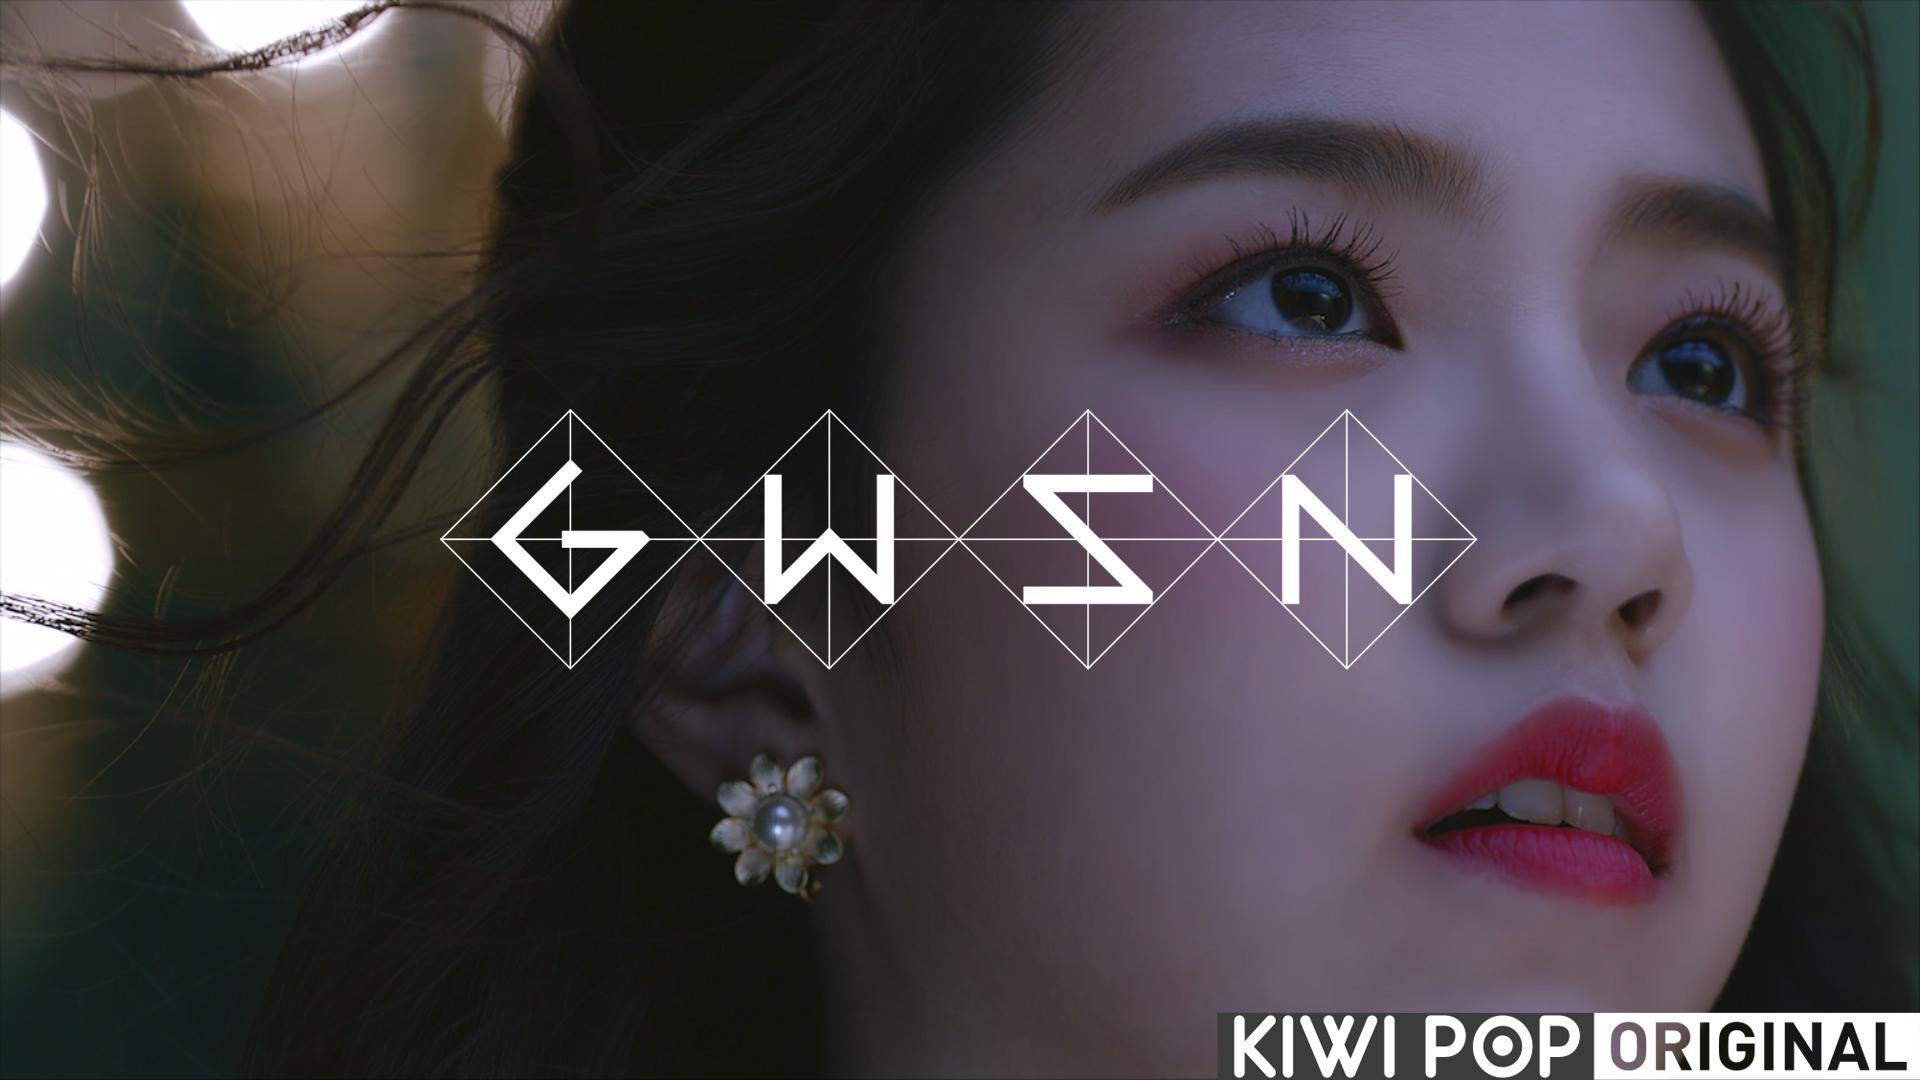 [GWSN] 공원소녀 - Puzzle Moon(퍼즐문) MV